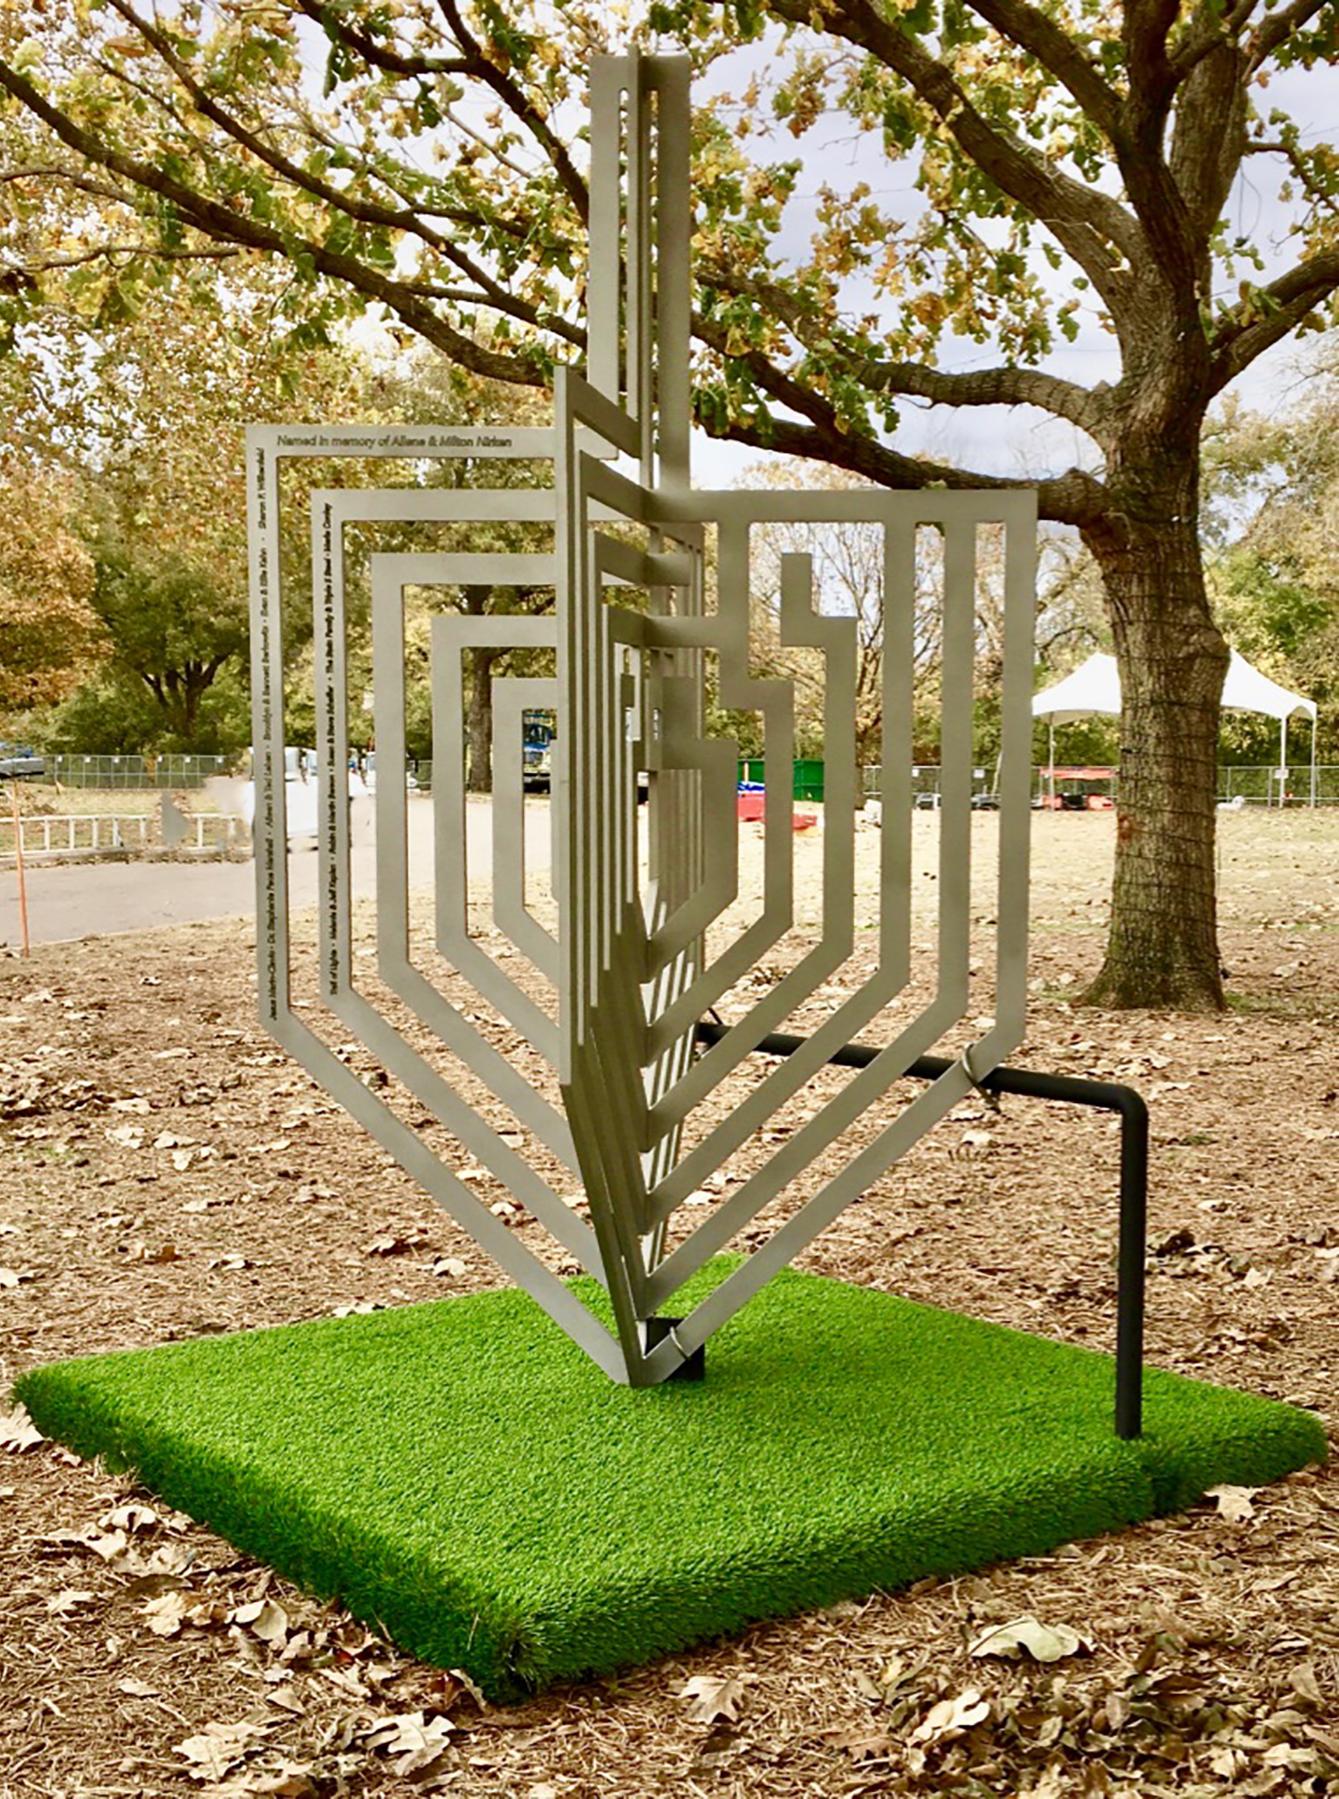 The Dreidel Labyrinth Sculpture©Series 4